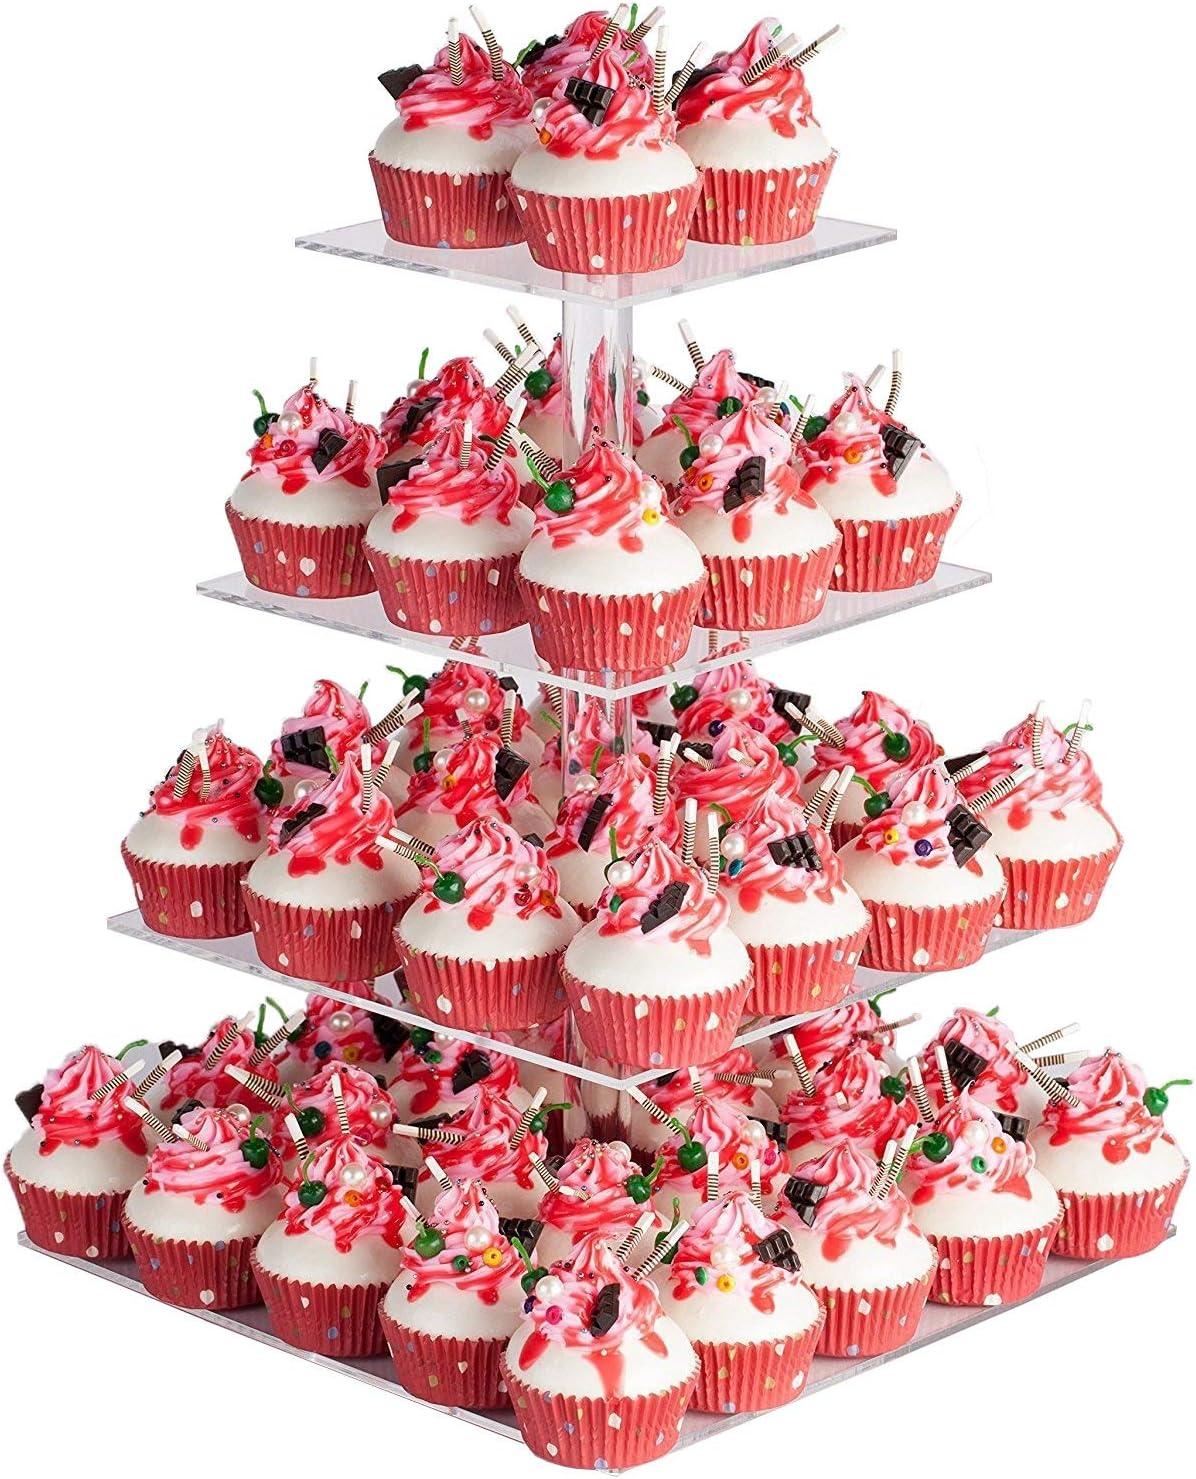 11 Cup Cupcake Stand Dessert Wedding Birthday Cake Assembly Display Tree